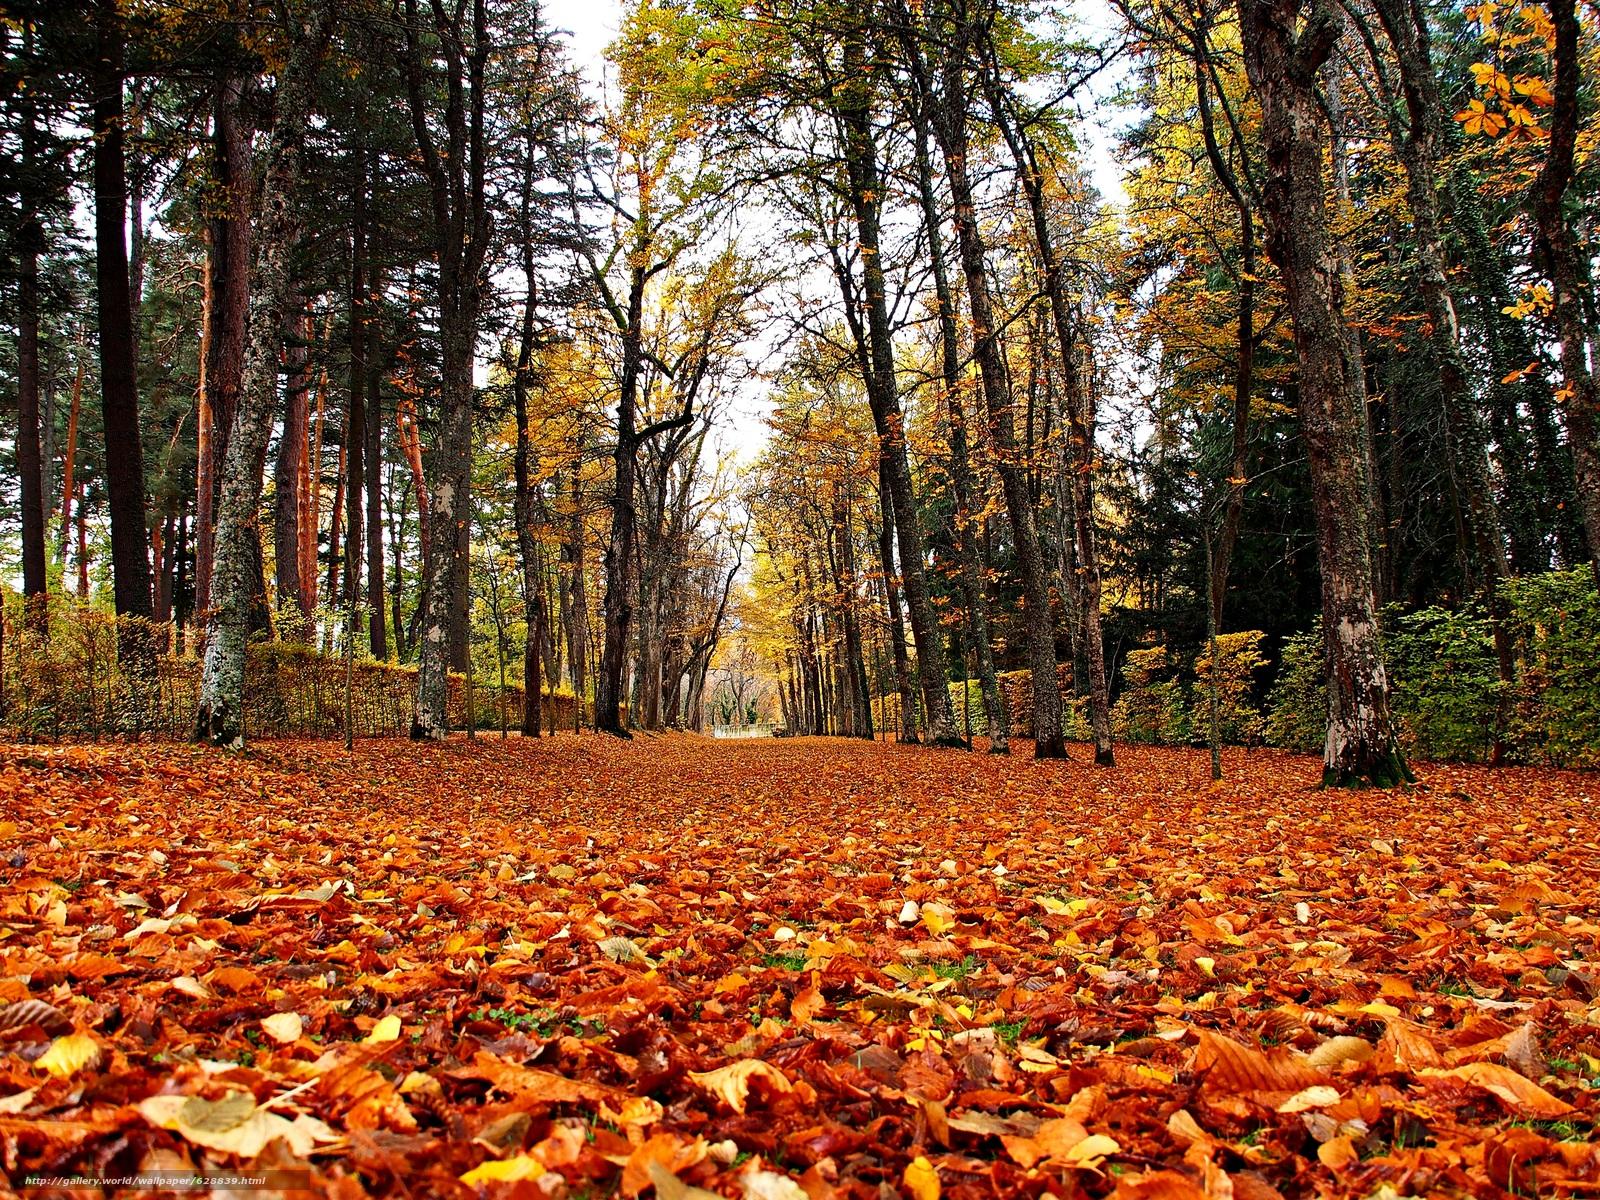 деревья, дорога, парк, пейзаж, осень